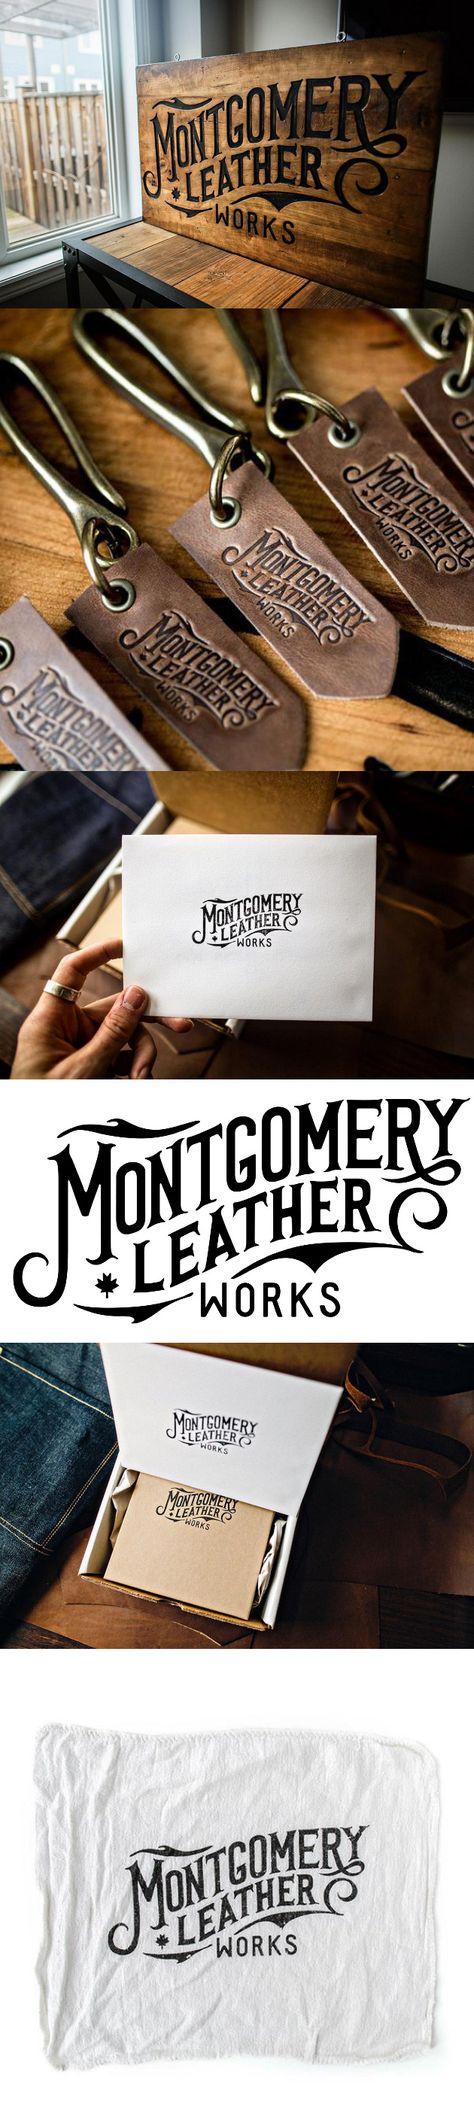 Montgomery Leather Works Branding by Oban Jones